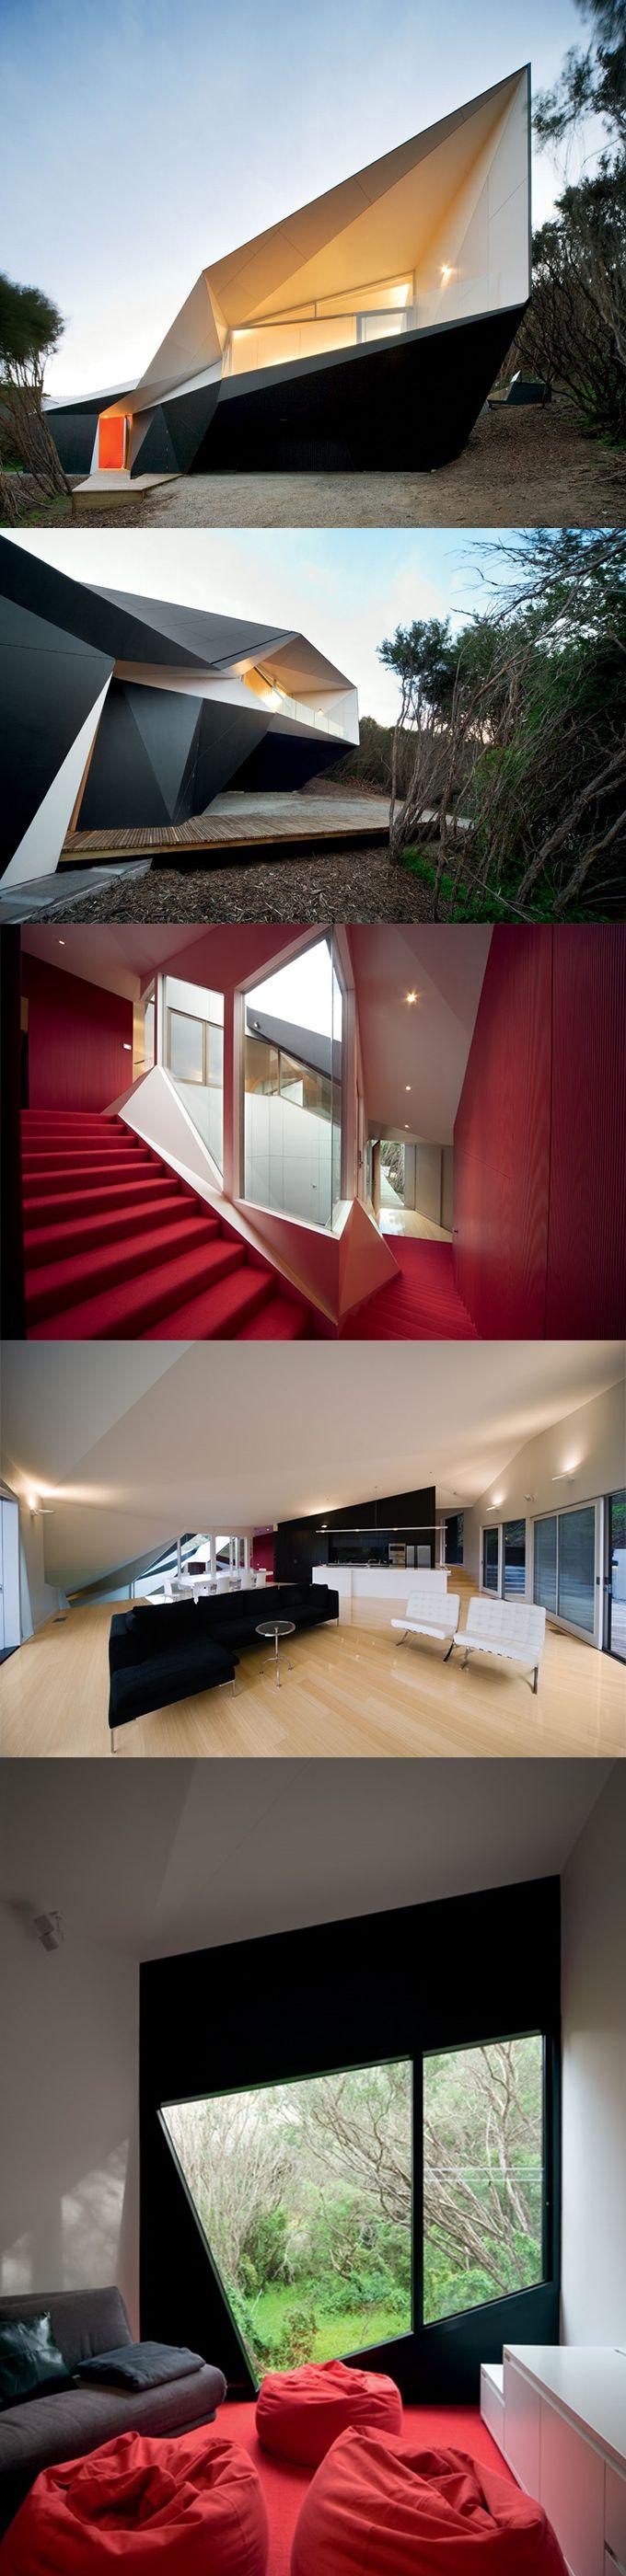 Klein Bottle House   Design: McBride Charles Ryan Photos: John Gollings  Inspired By The